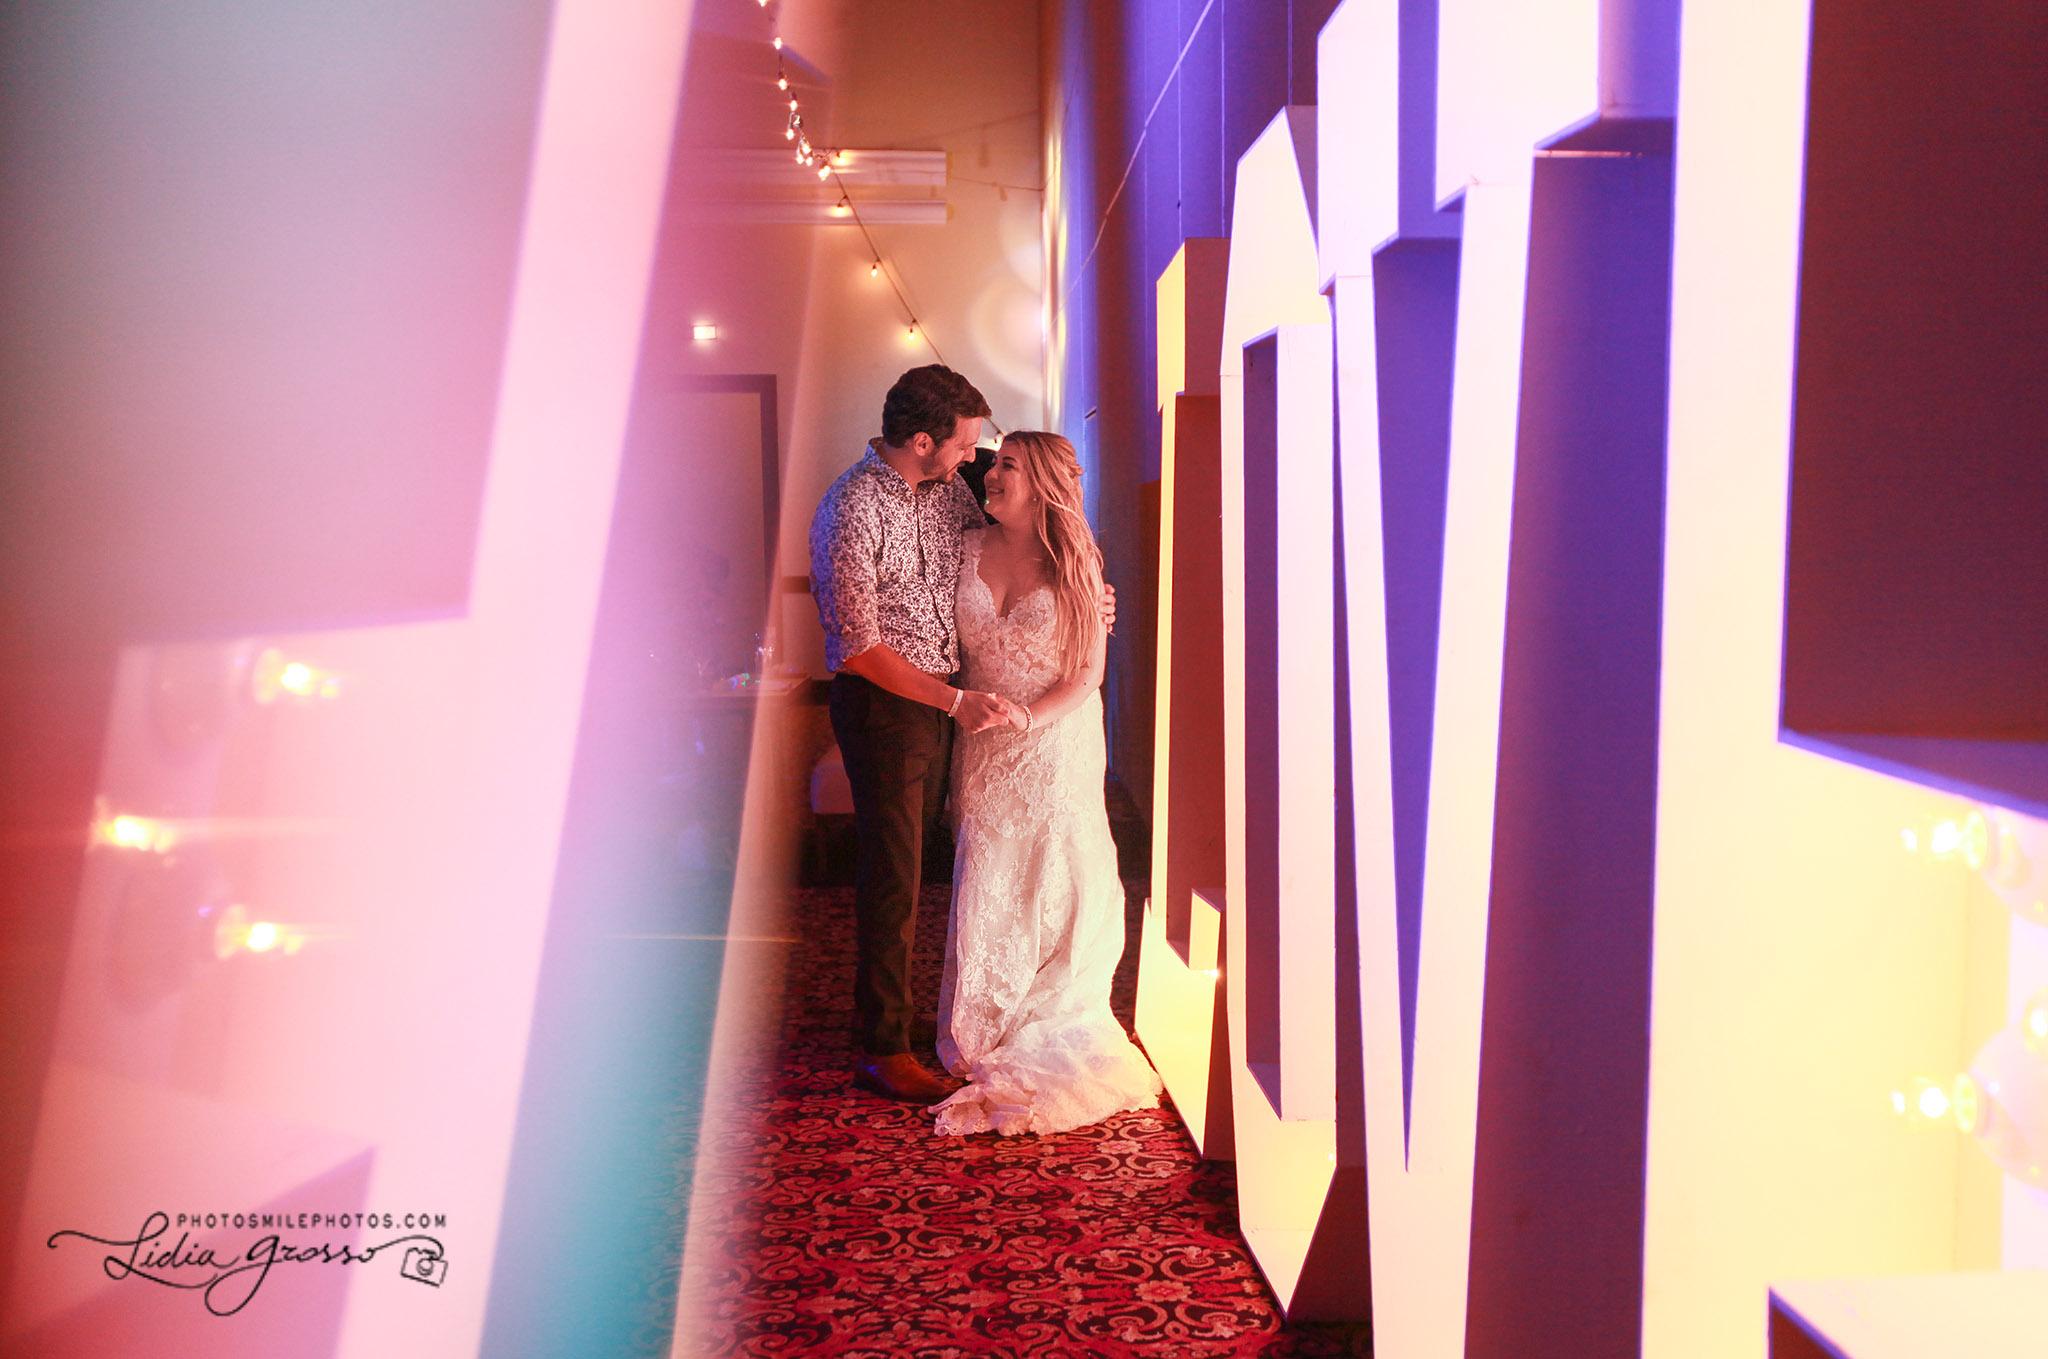 SA-Hilton-Cancun-wedding-blog-s.jpg